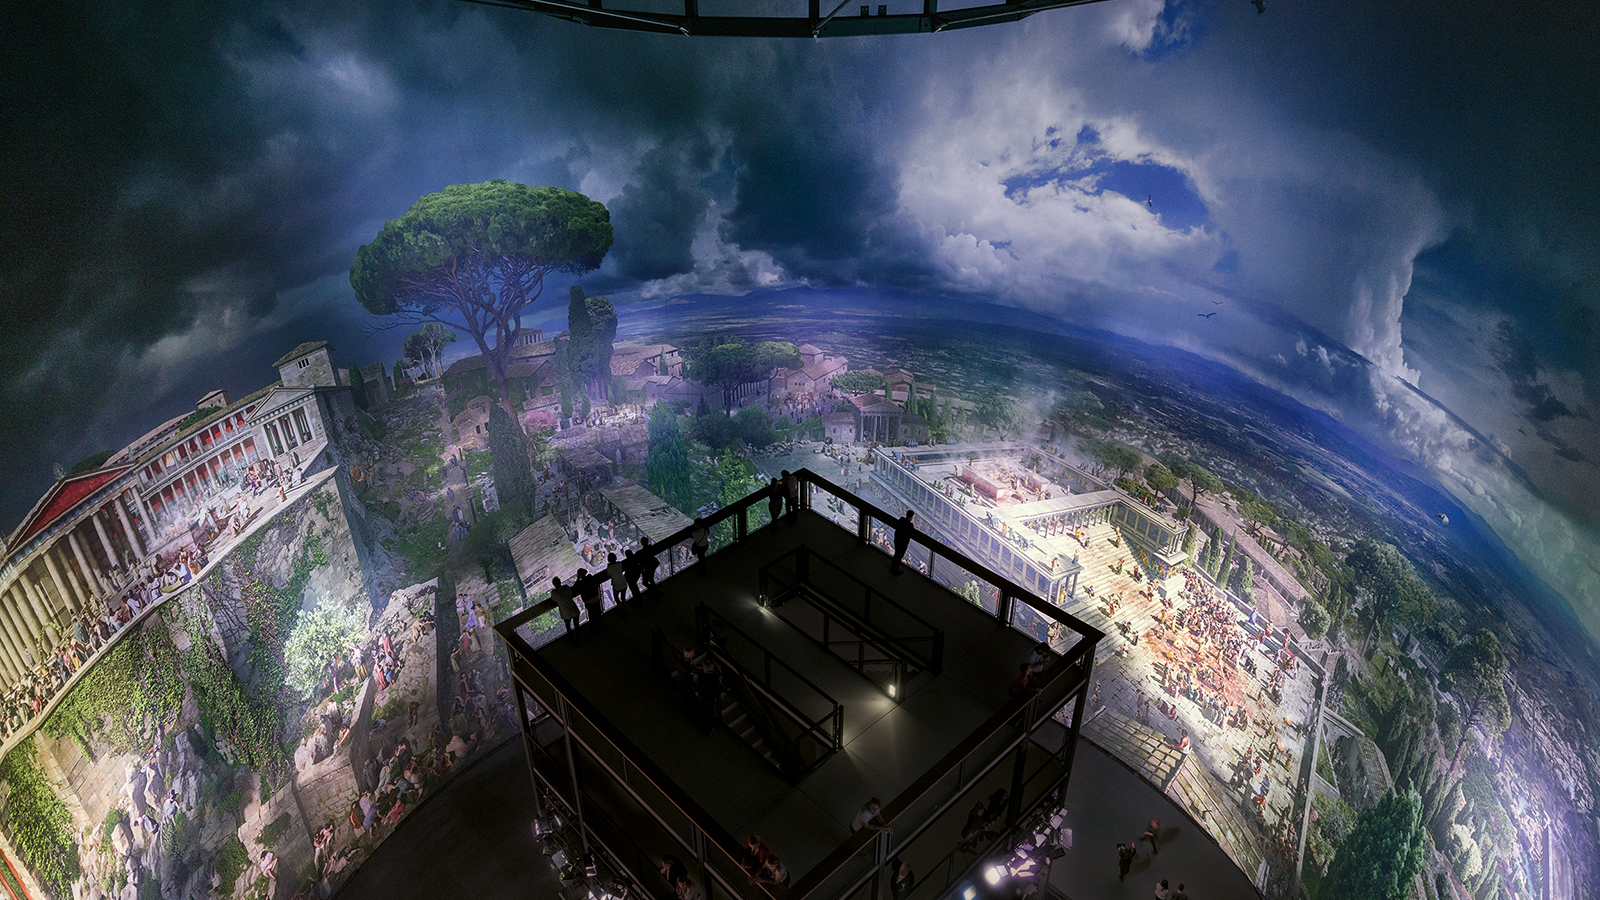 2020 Conversations - Pergamon Panorama